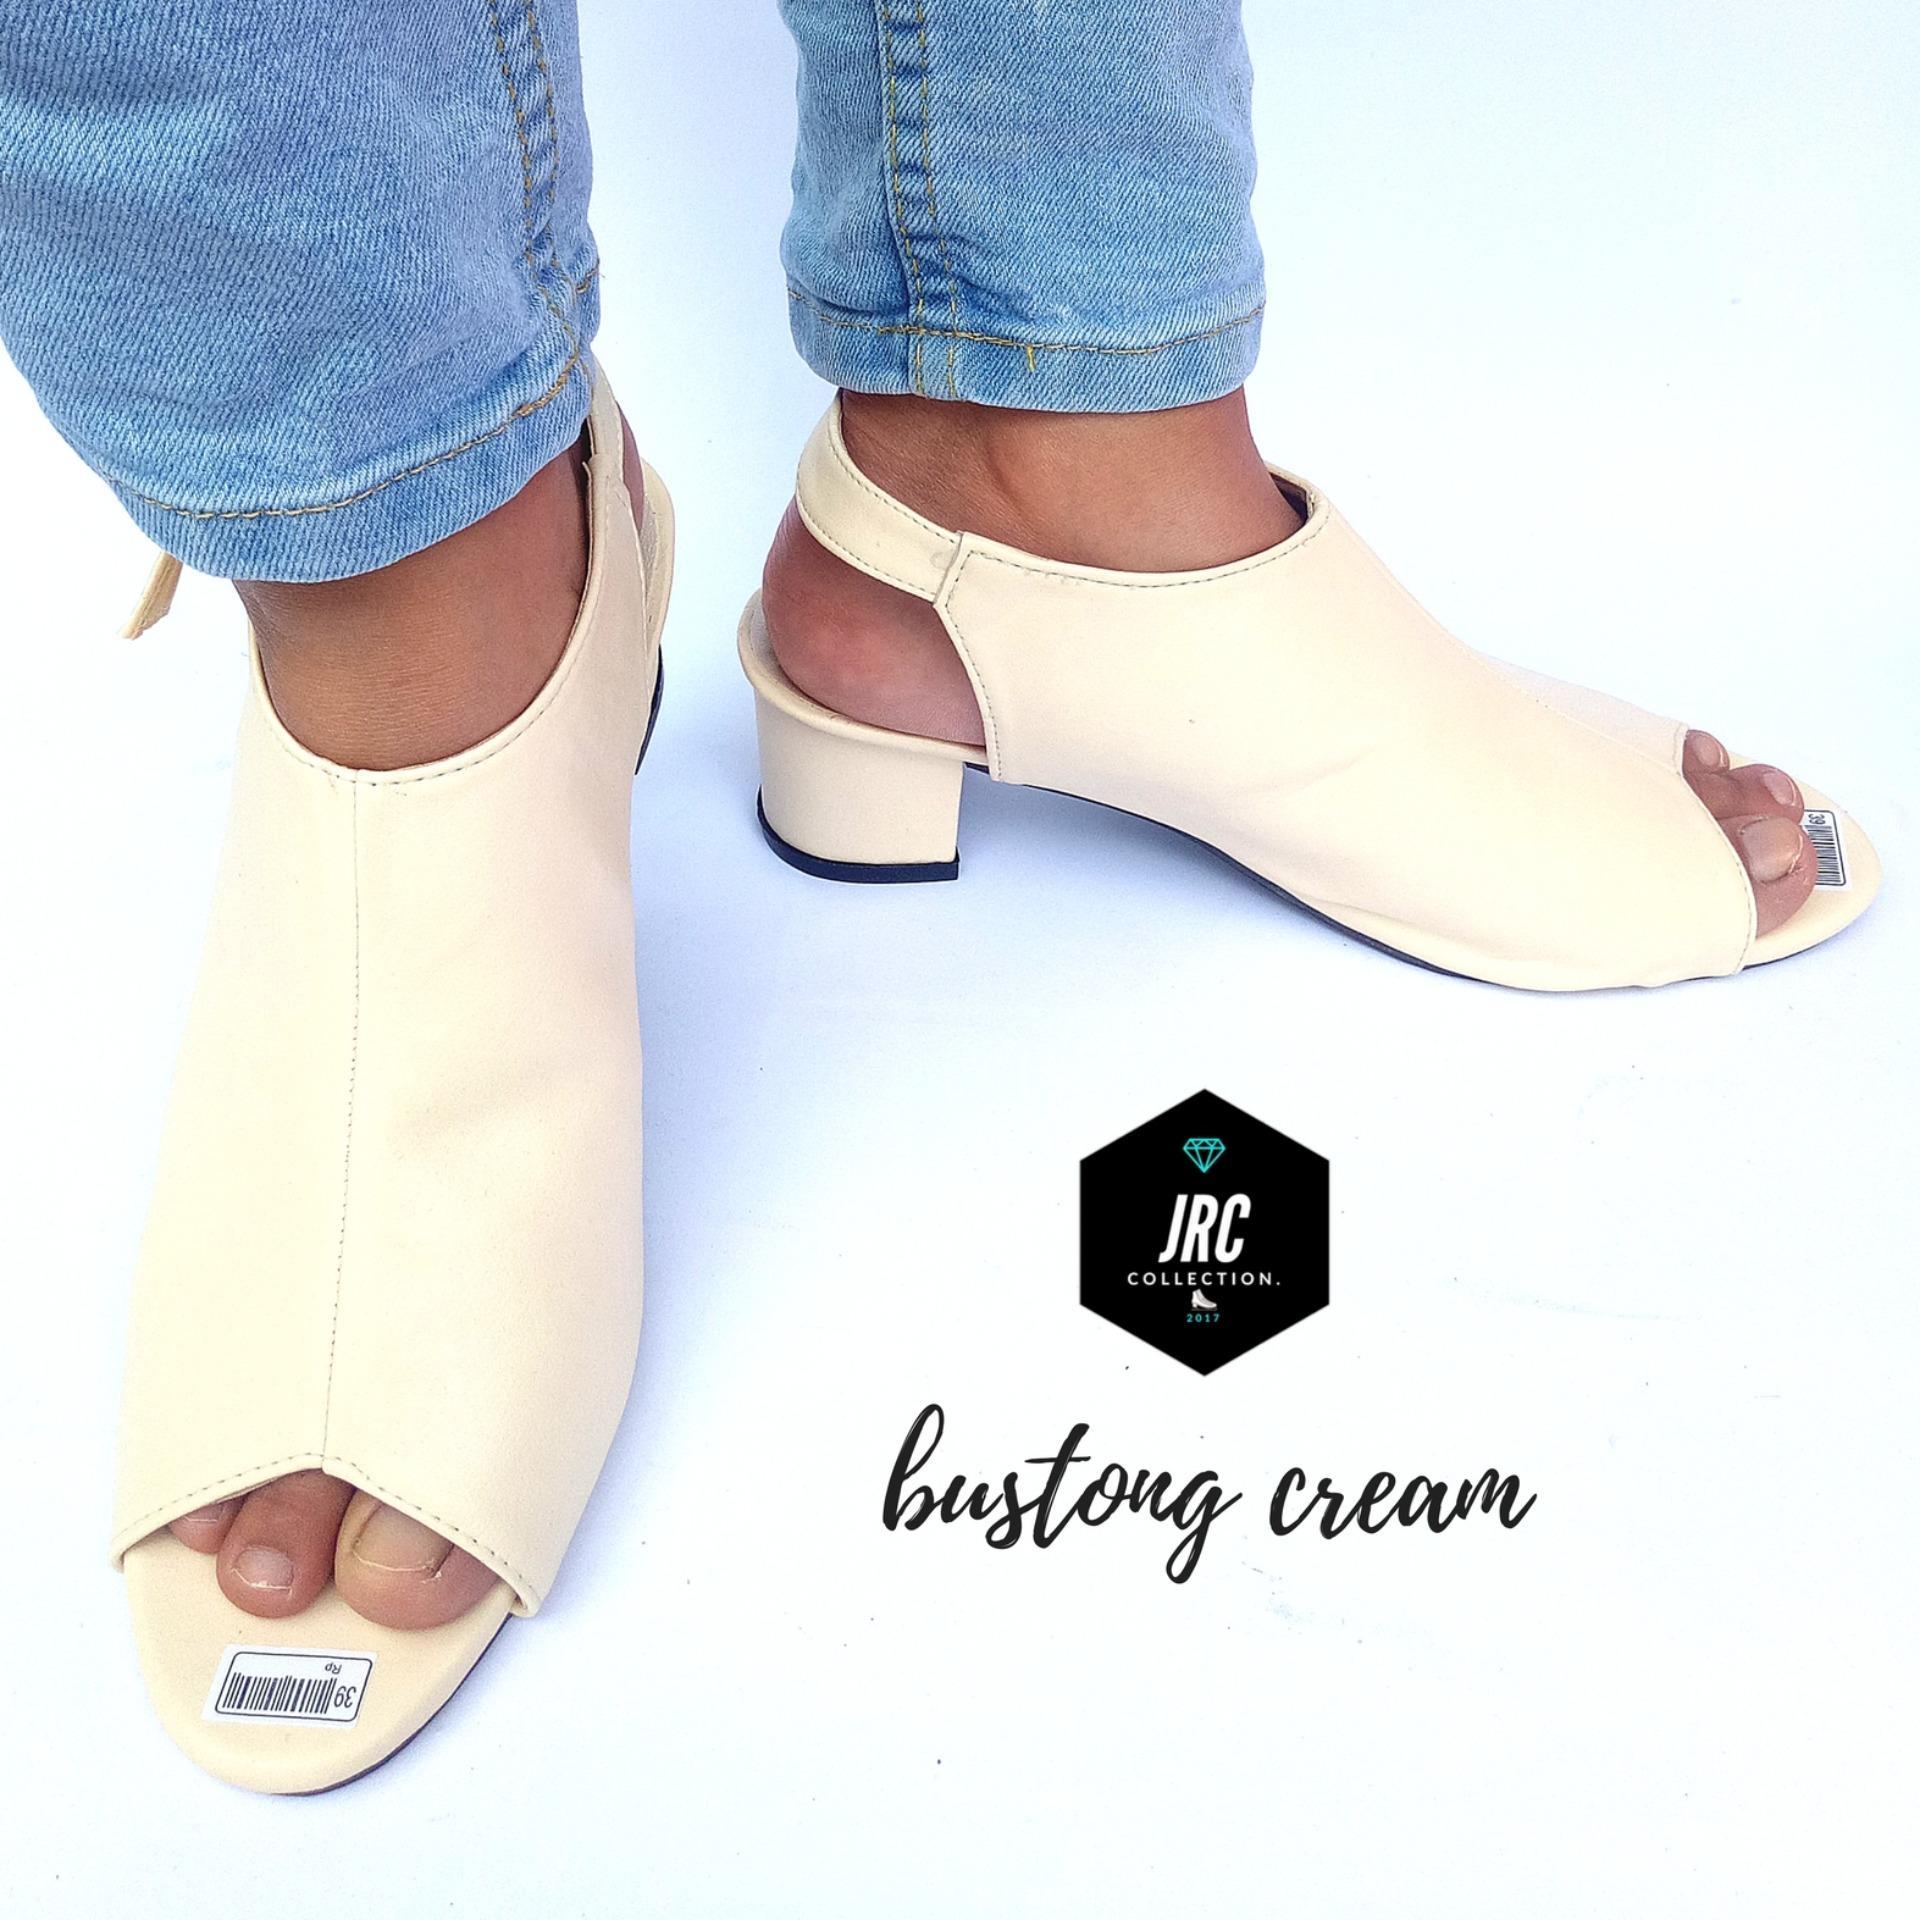 Pencarian Termurah JRC sepatu wanita hak tahu bustong highheels harga penawaran - Hanya Rp39.251